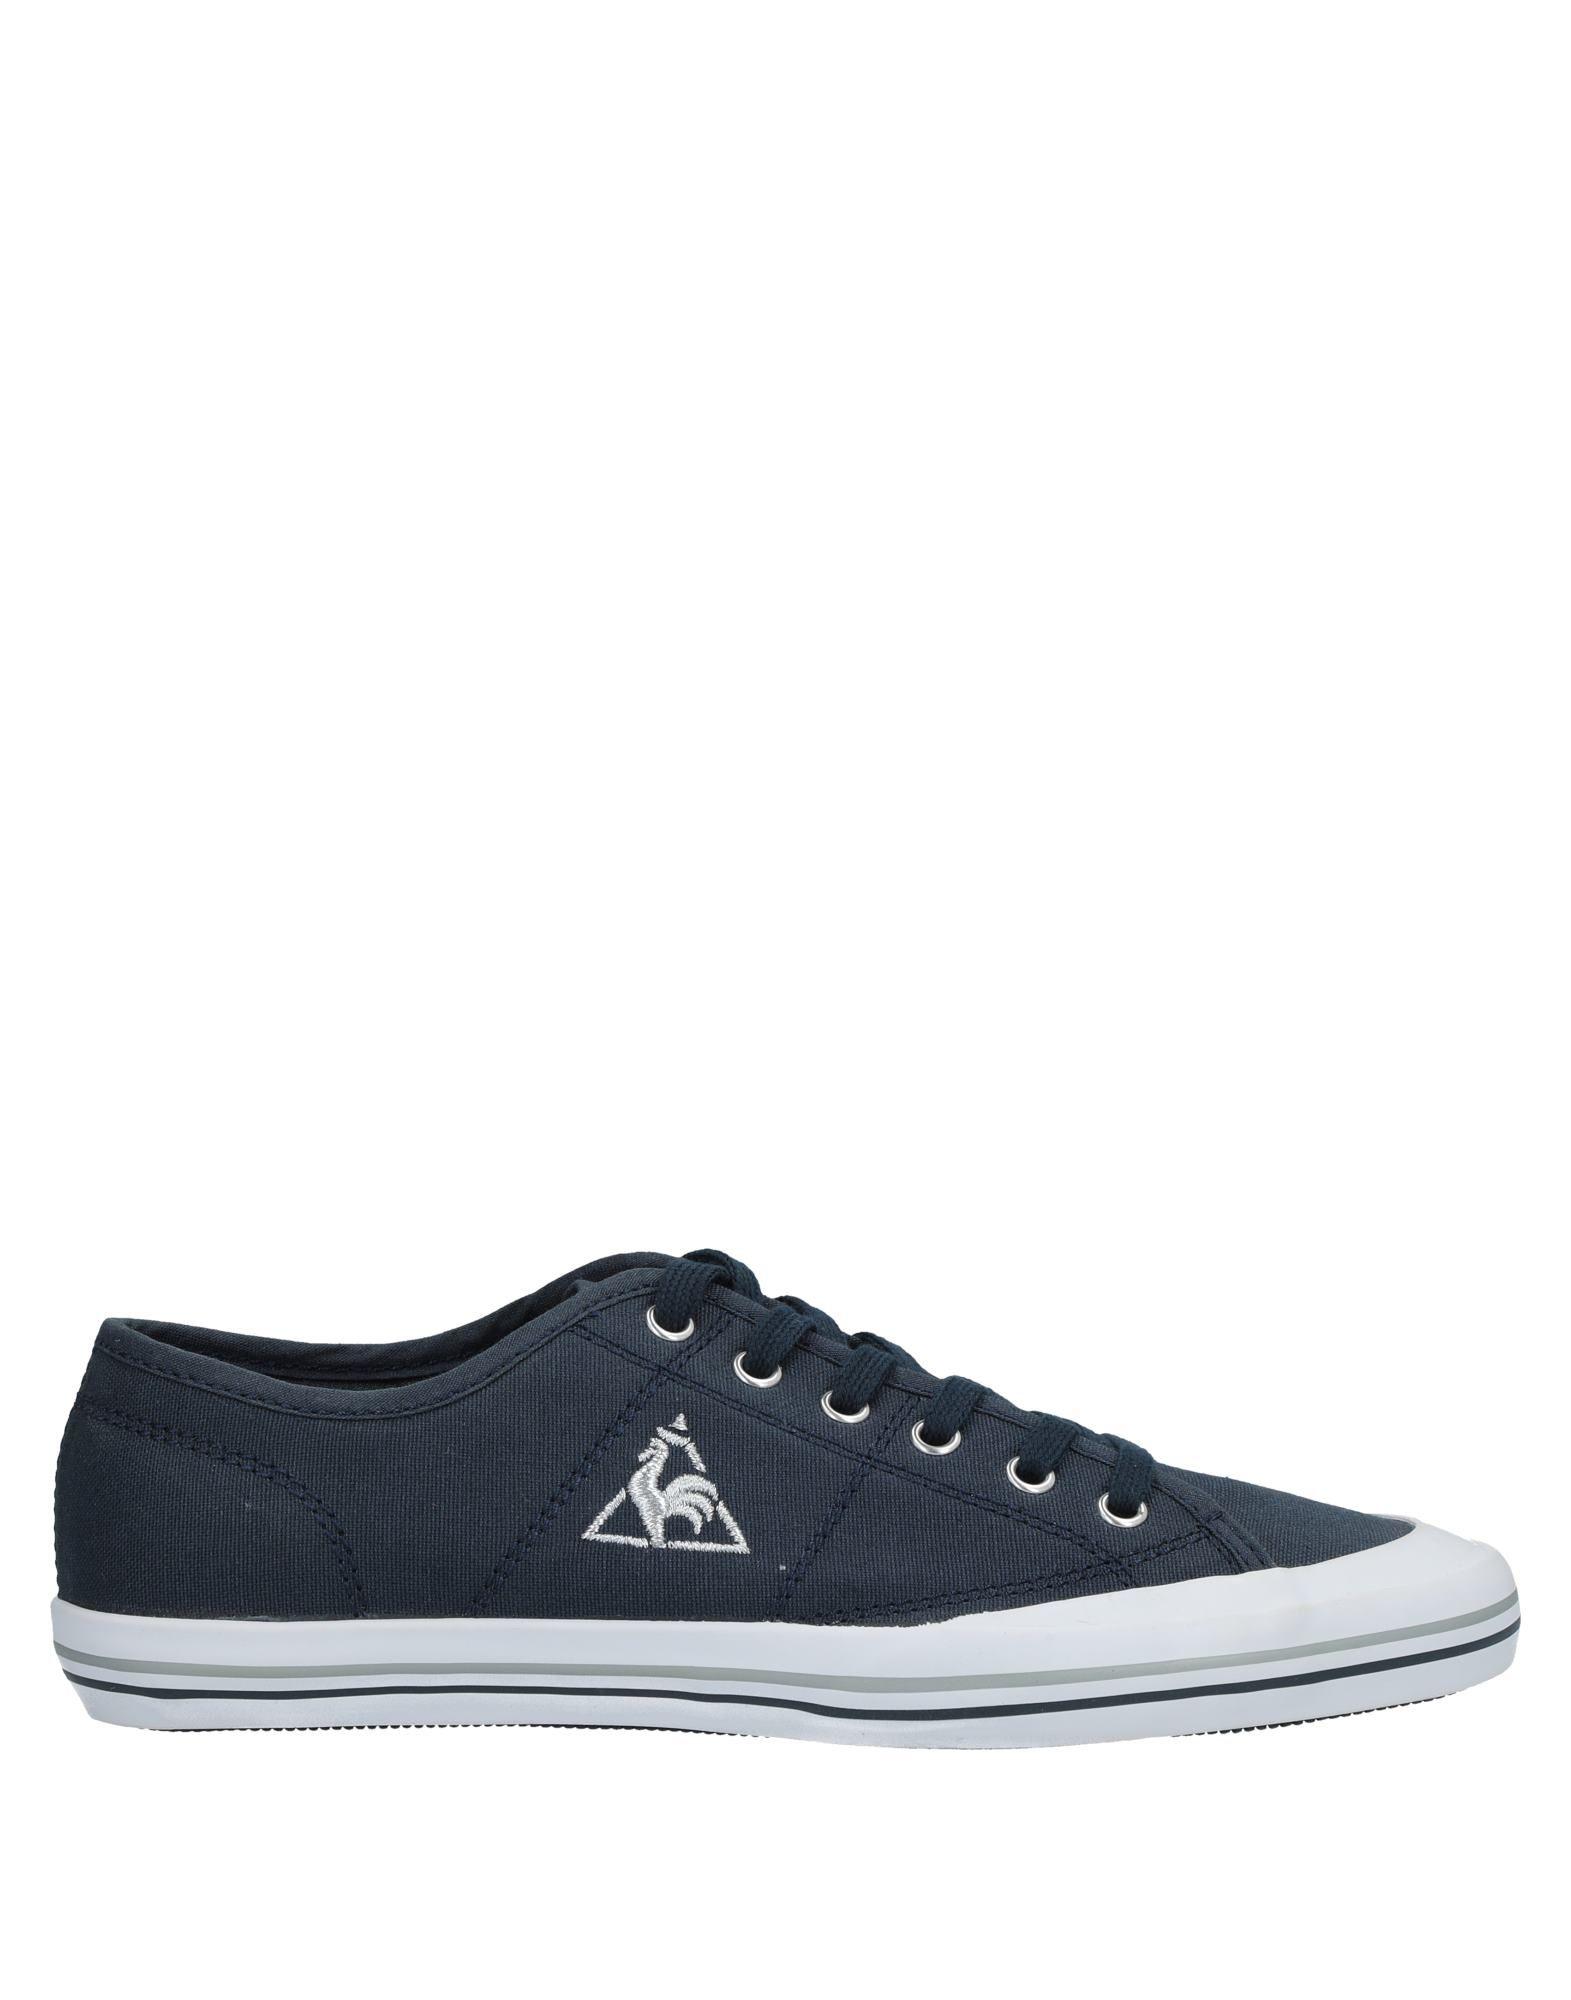 Le Coq Sportif Sneakers Damen  11533670VH Neue Schuhe